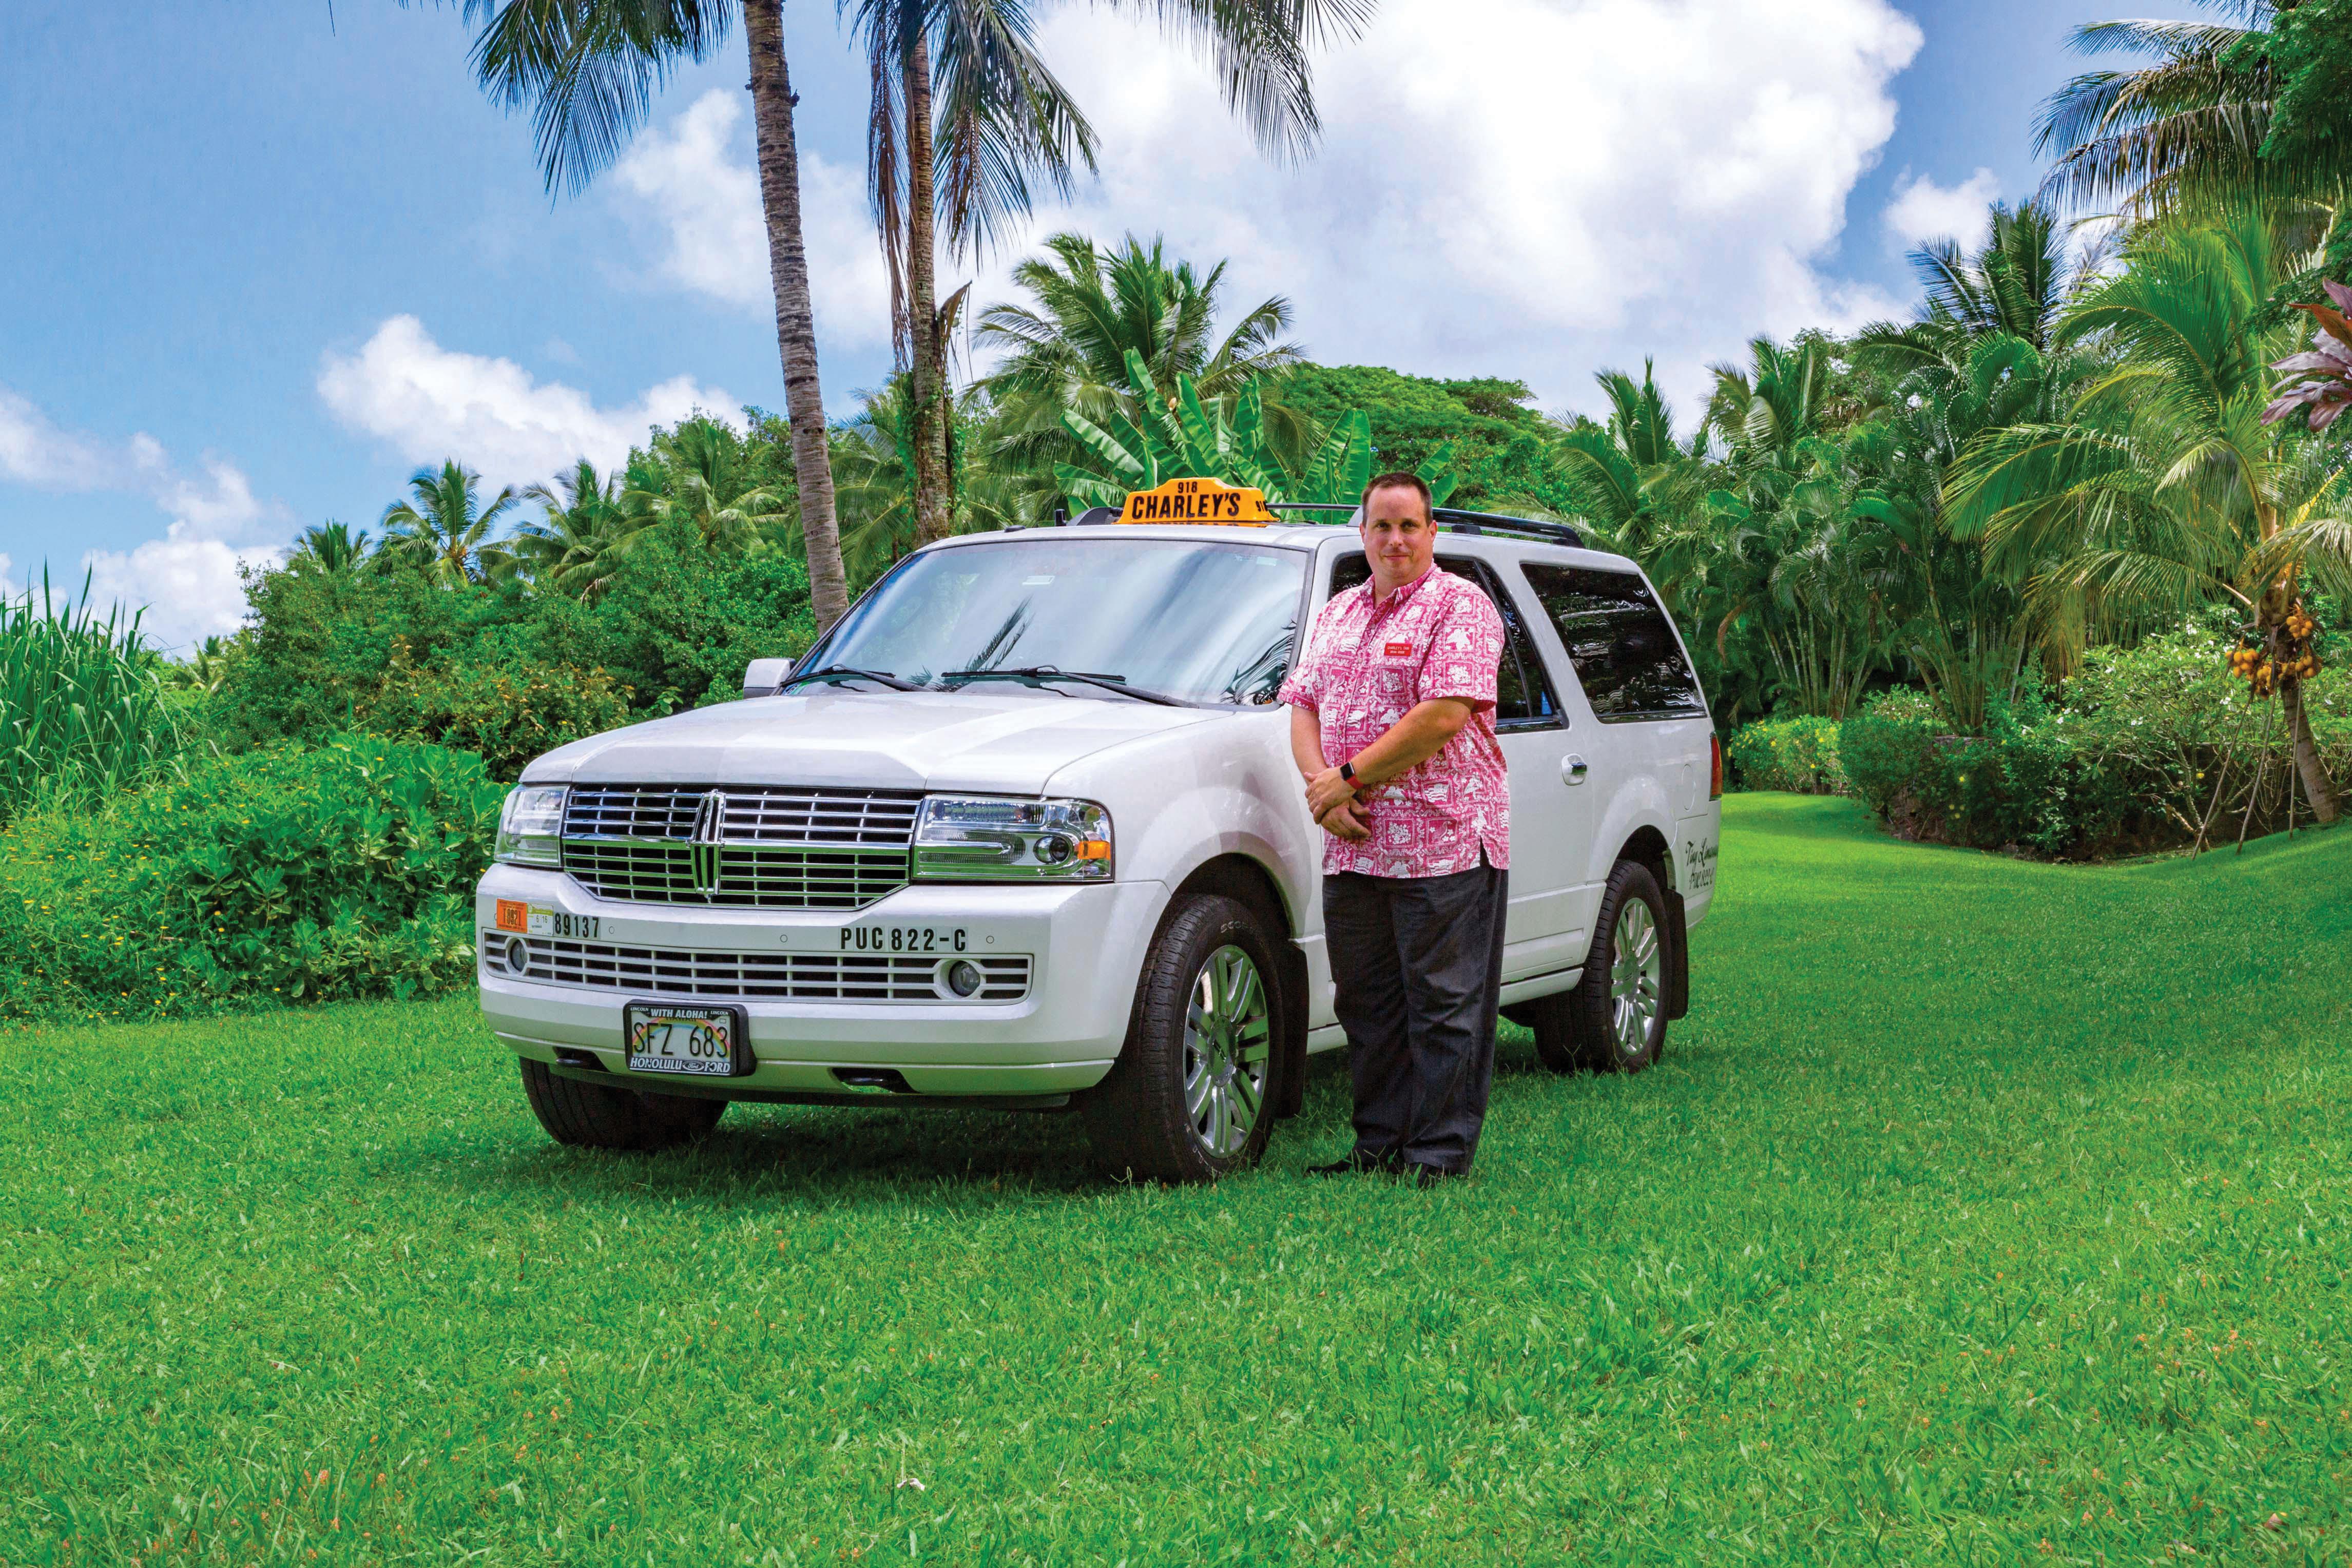 charleys-taxi-lincoln-navigator-w-driver_160809-395_rgb